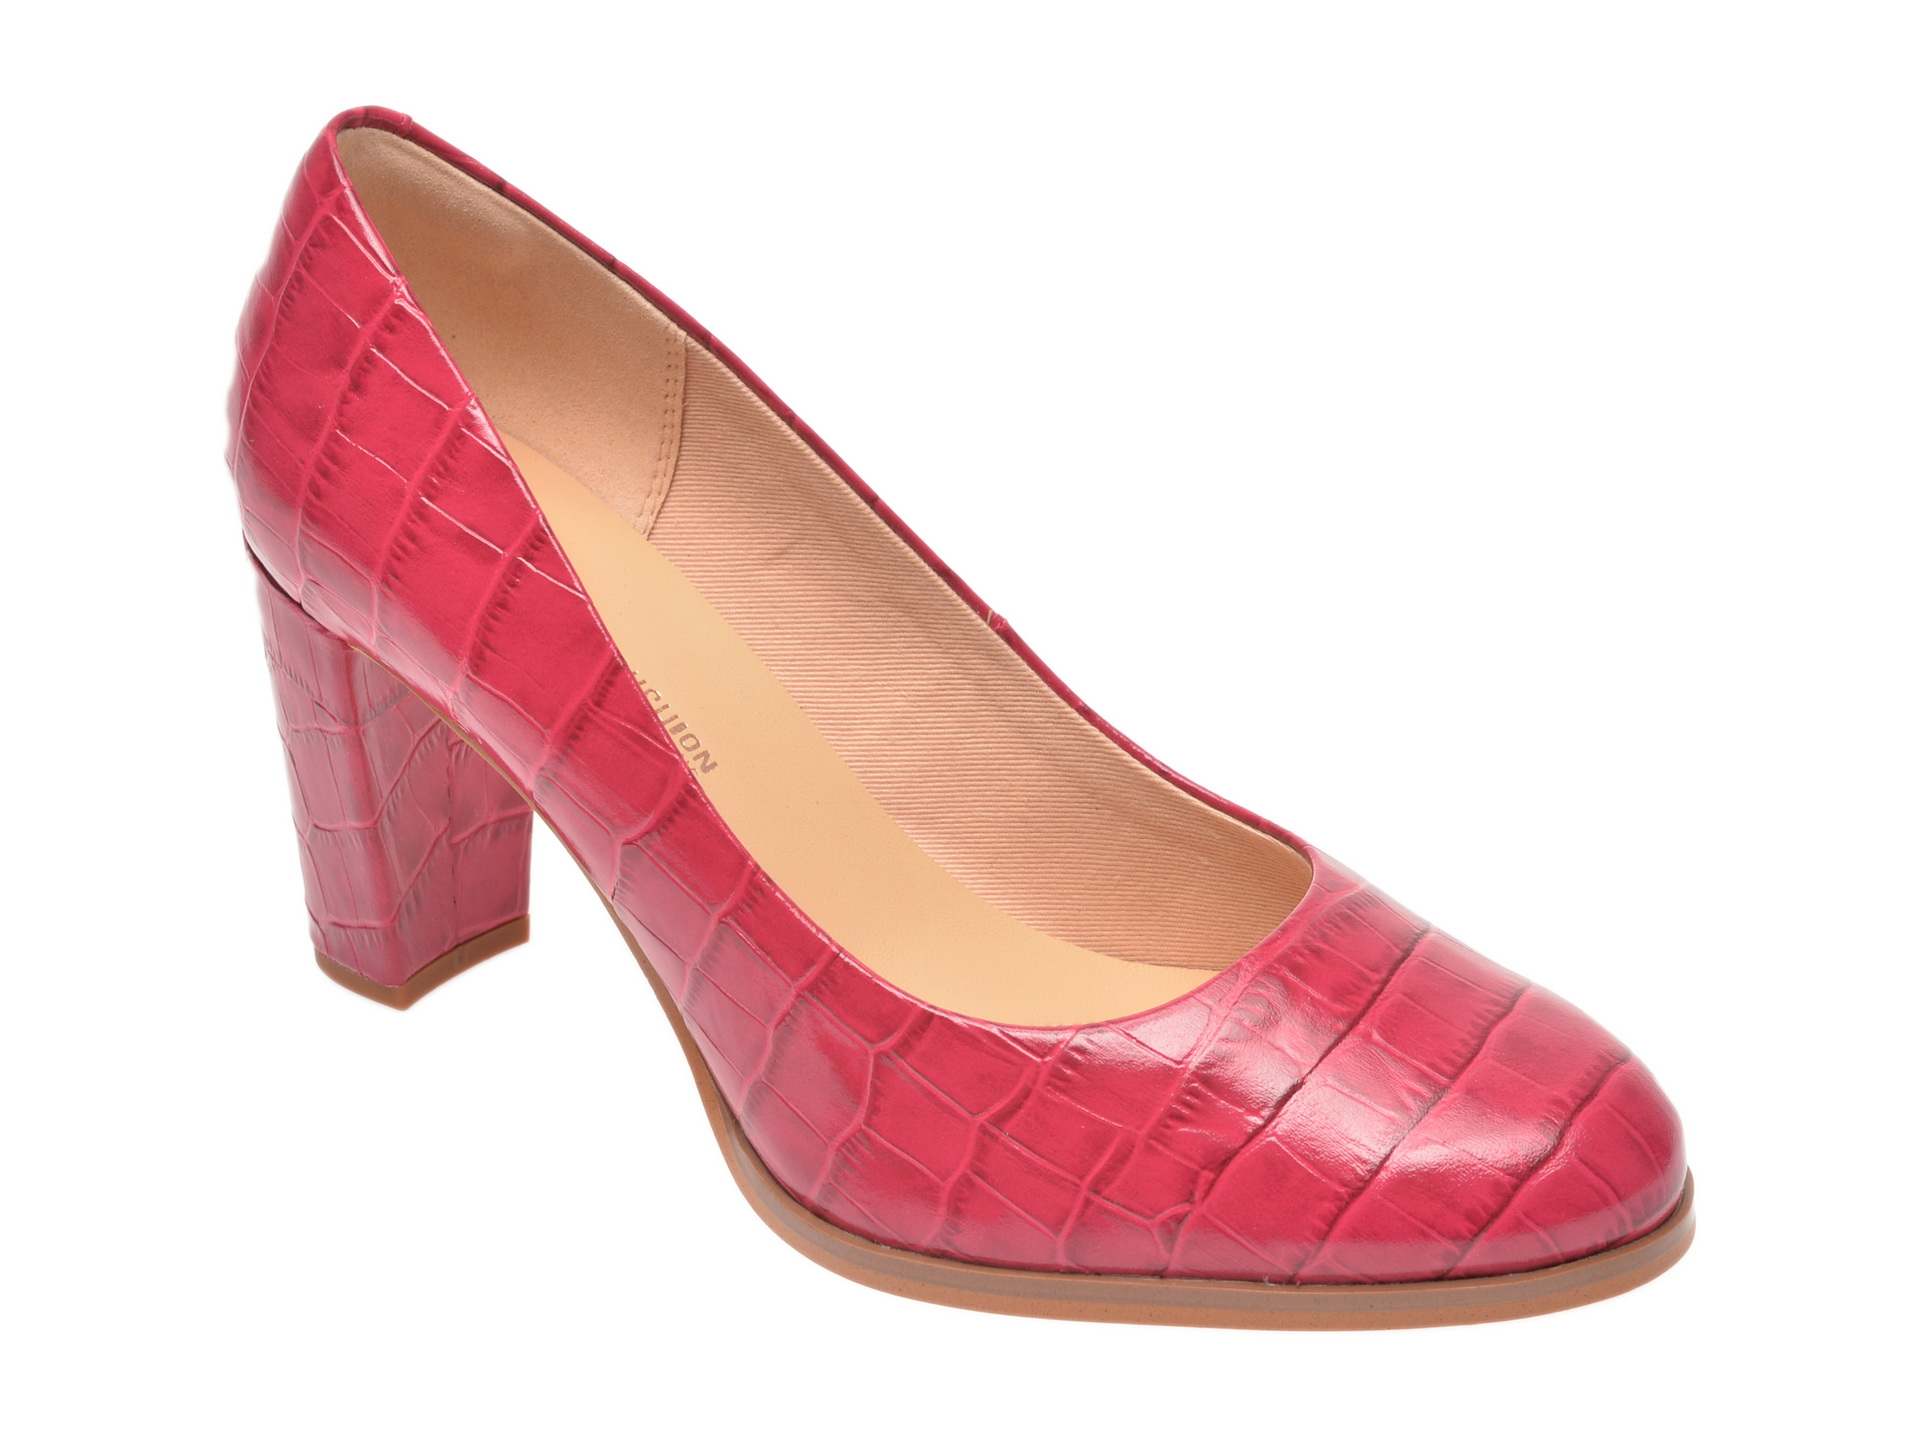 Pantofi CLARKS roz, Kaylin Cara, din piele naturala imagine